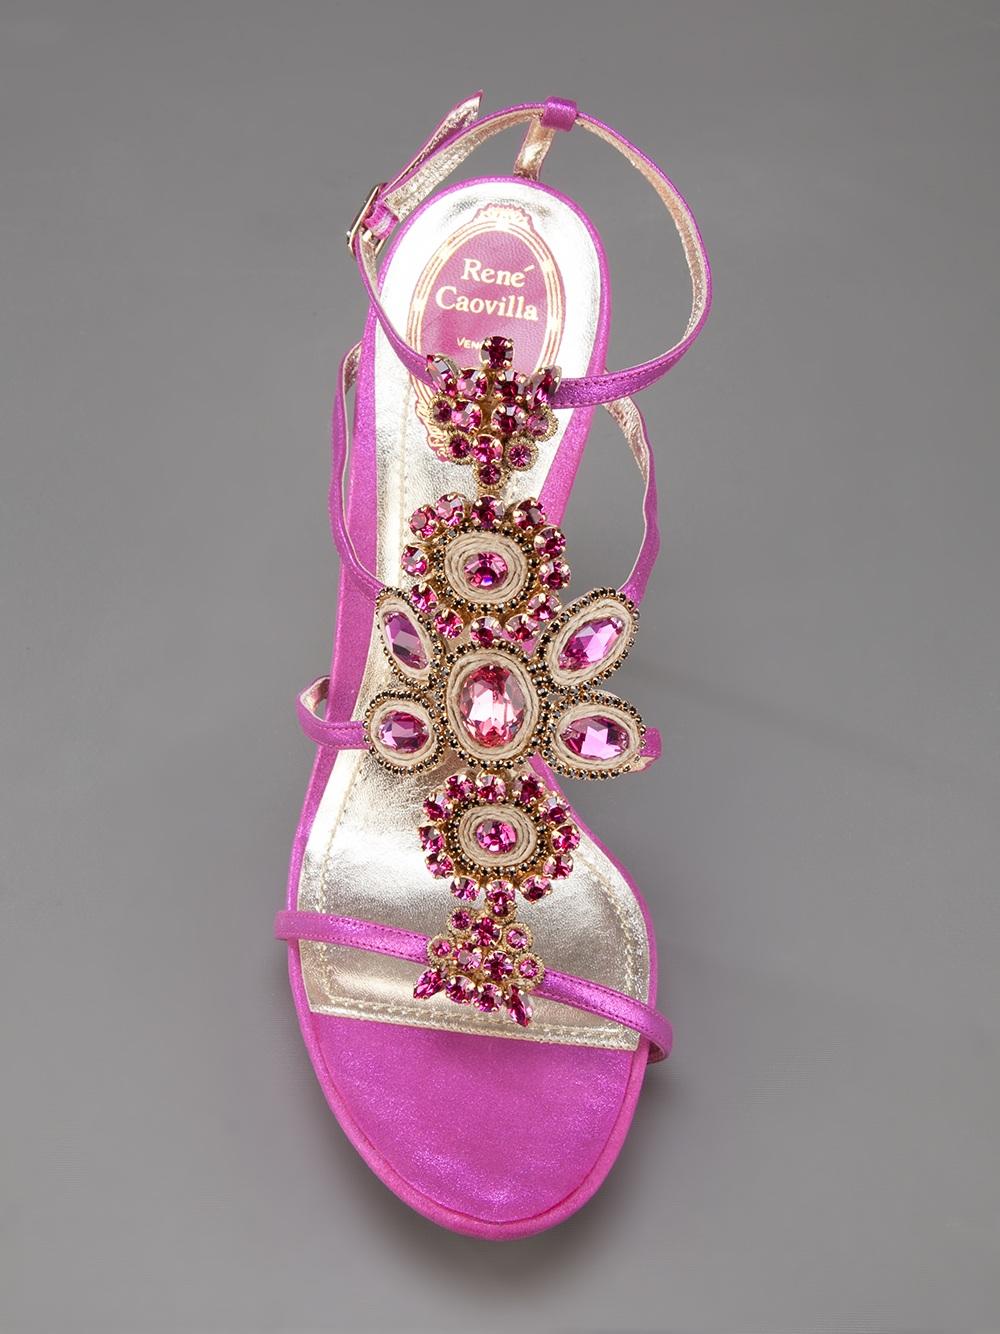 Rene Caovilla Jewel Embellished Sandal In Pink Lyst